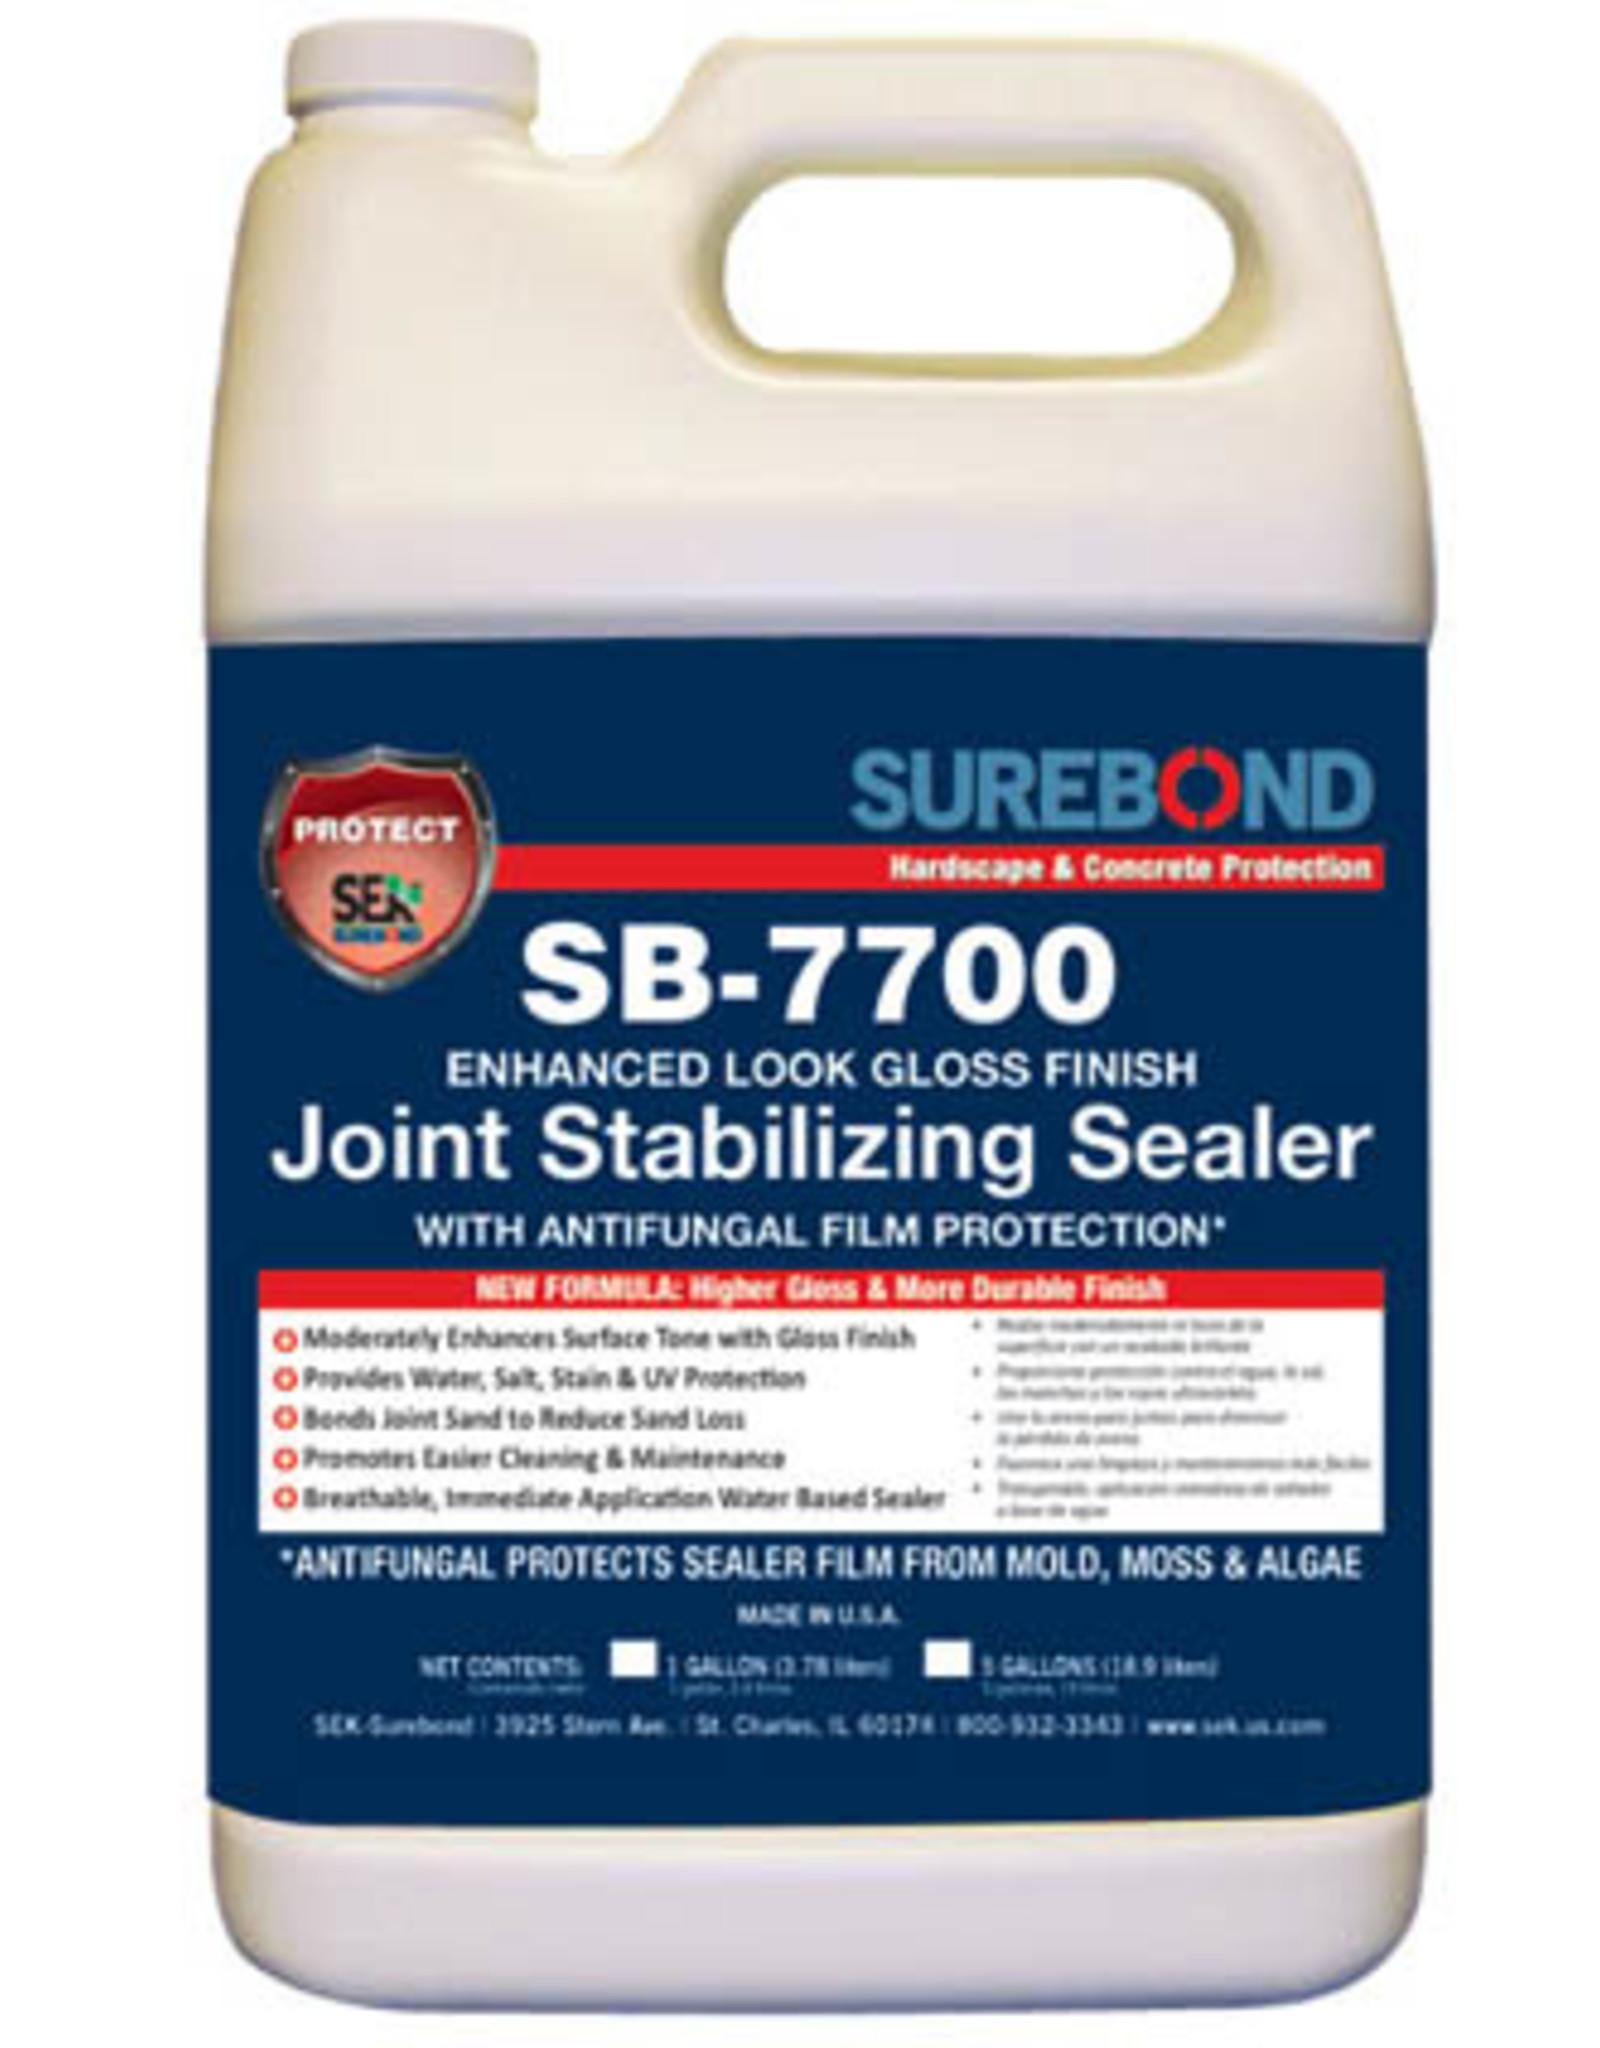 SEK Surebond SB-7700 Gloss Joint Stabilizing Sealer with Anti-Fungal Gallon